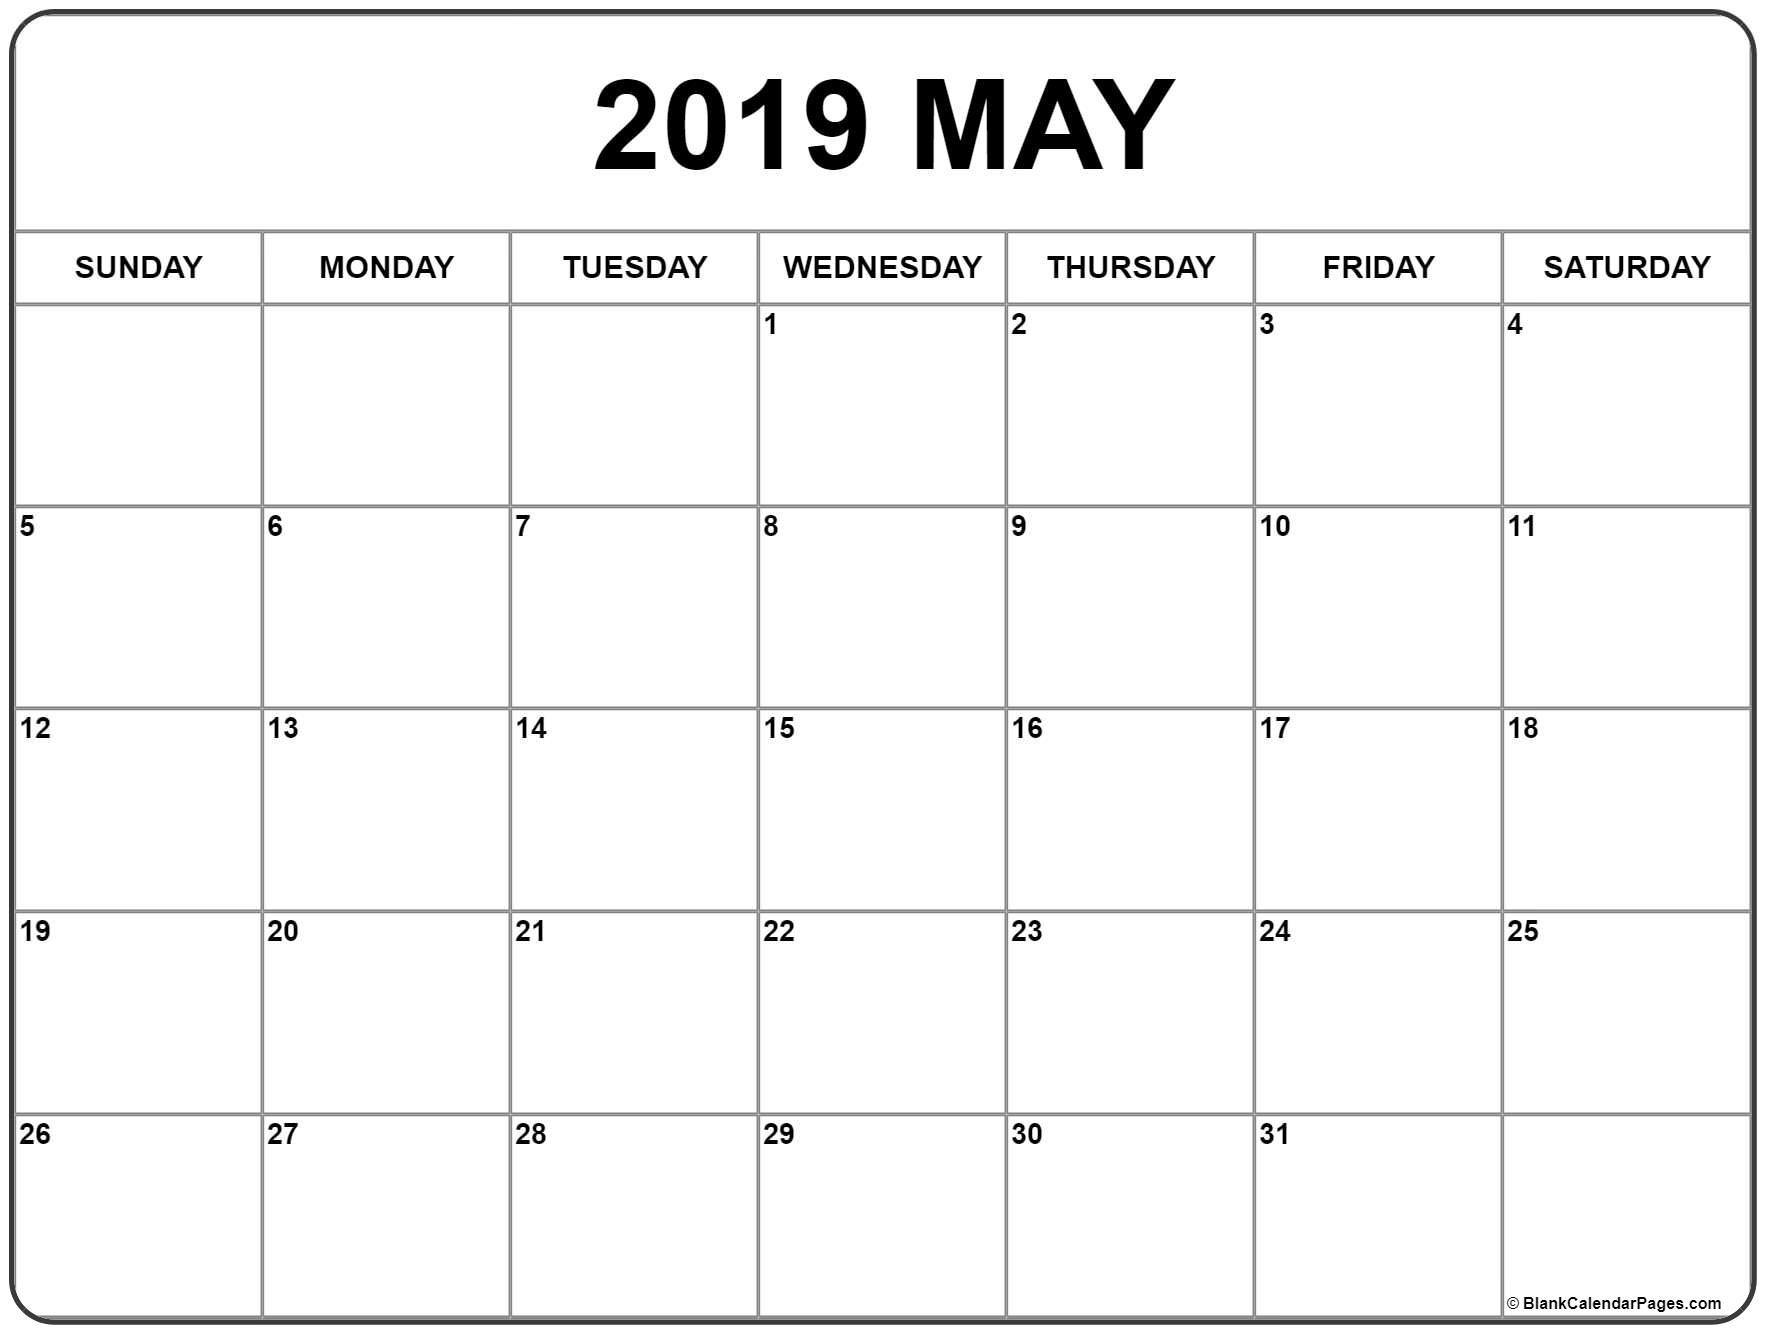 Texas Tech University Academic Calendar 2021 2021 | Printable Calendar 2020 2021 Regarding Texas Tech University Academic Calendar